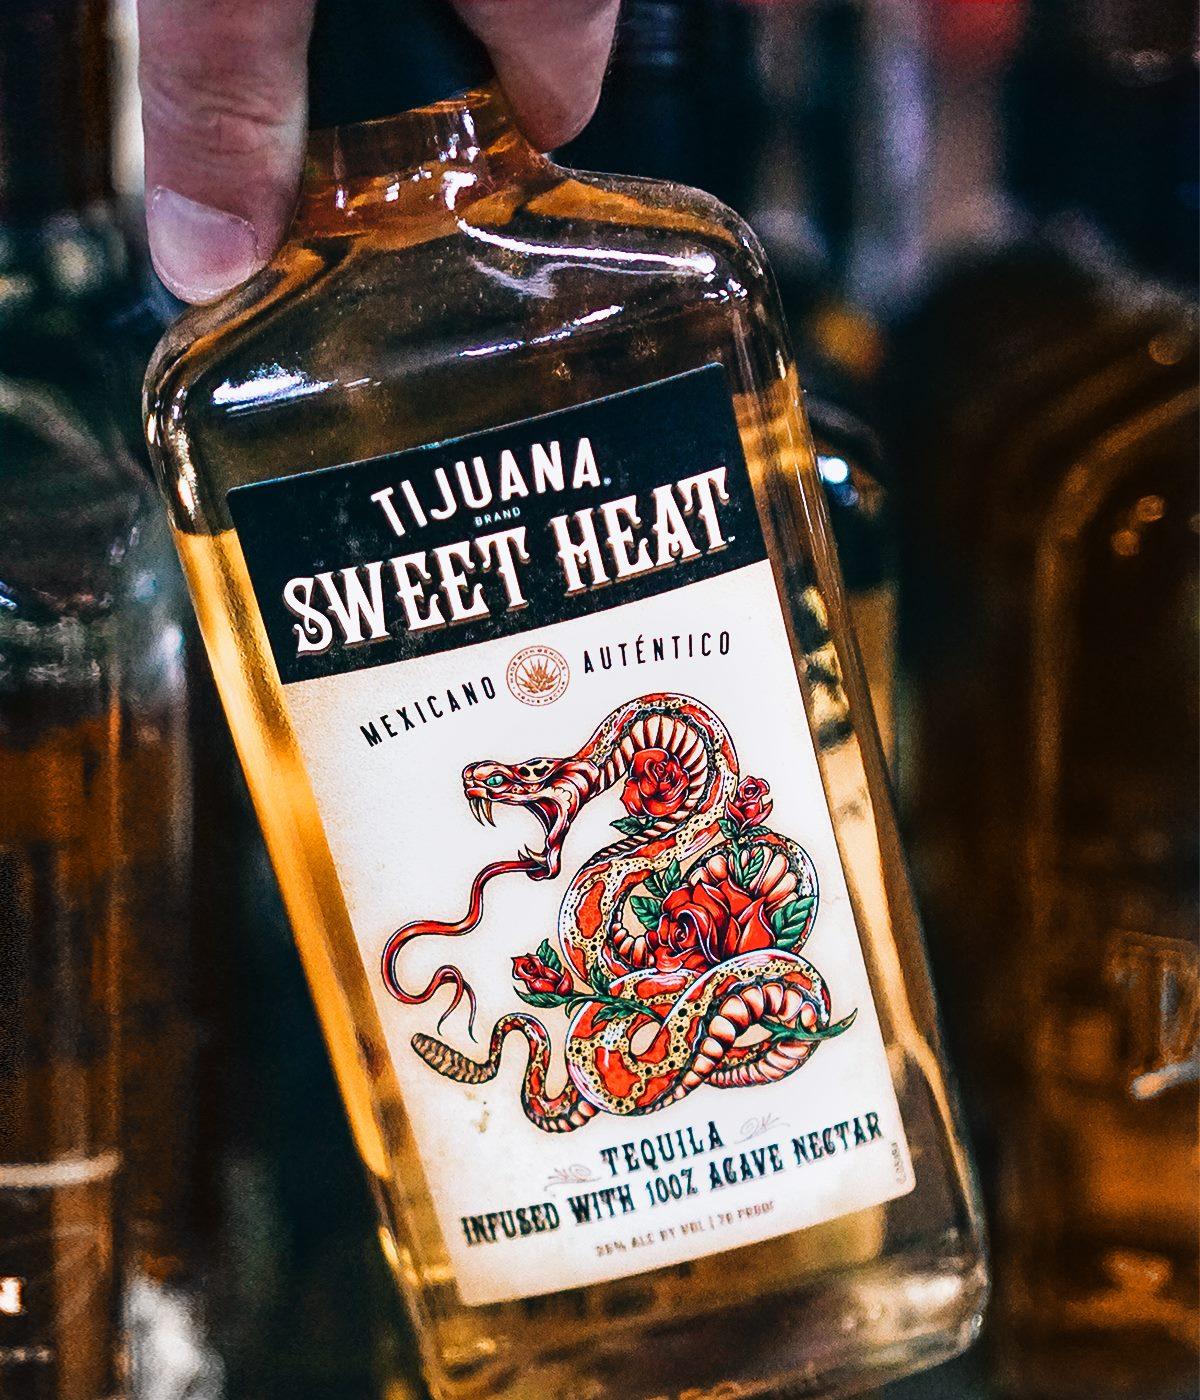 File:Tijuana Sweet Heat Tequila.jpg - Wikipedia